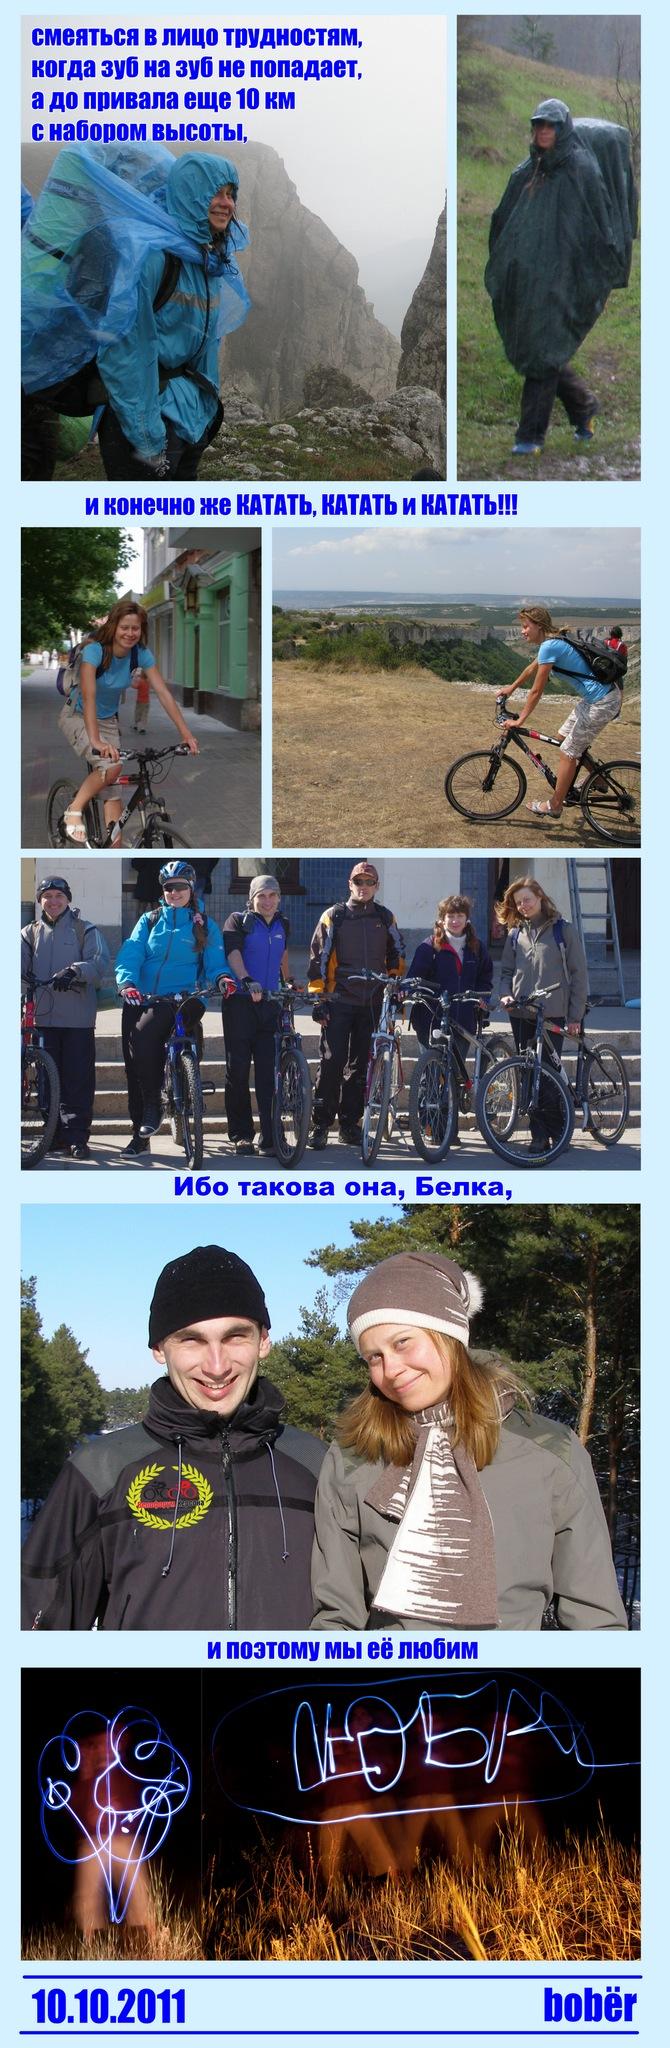 http://cs5299.vkontakte.ru/u10834284/120259584/w_5711d76f.jpg